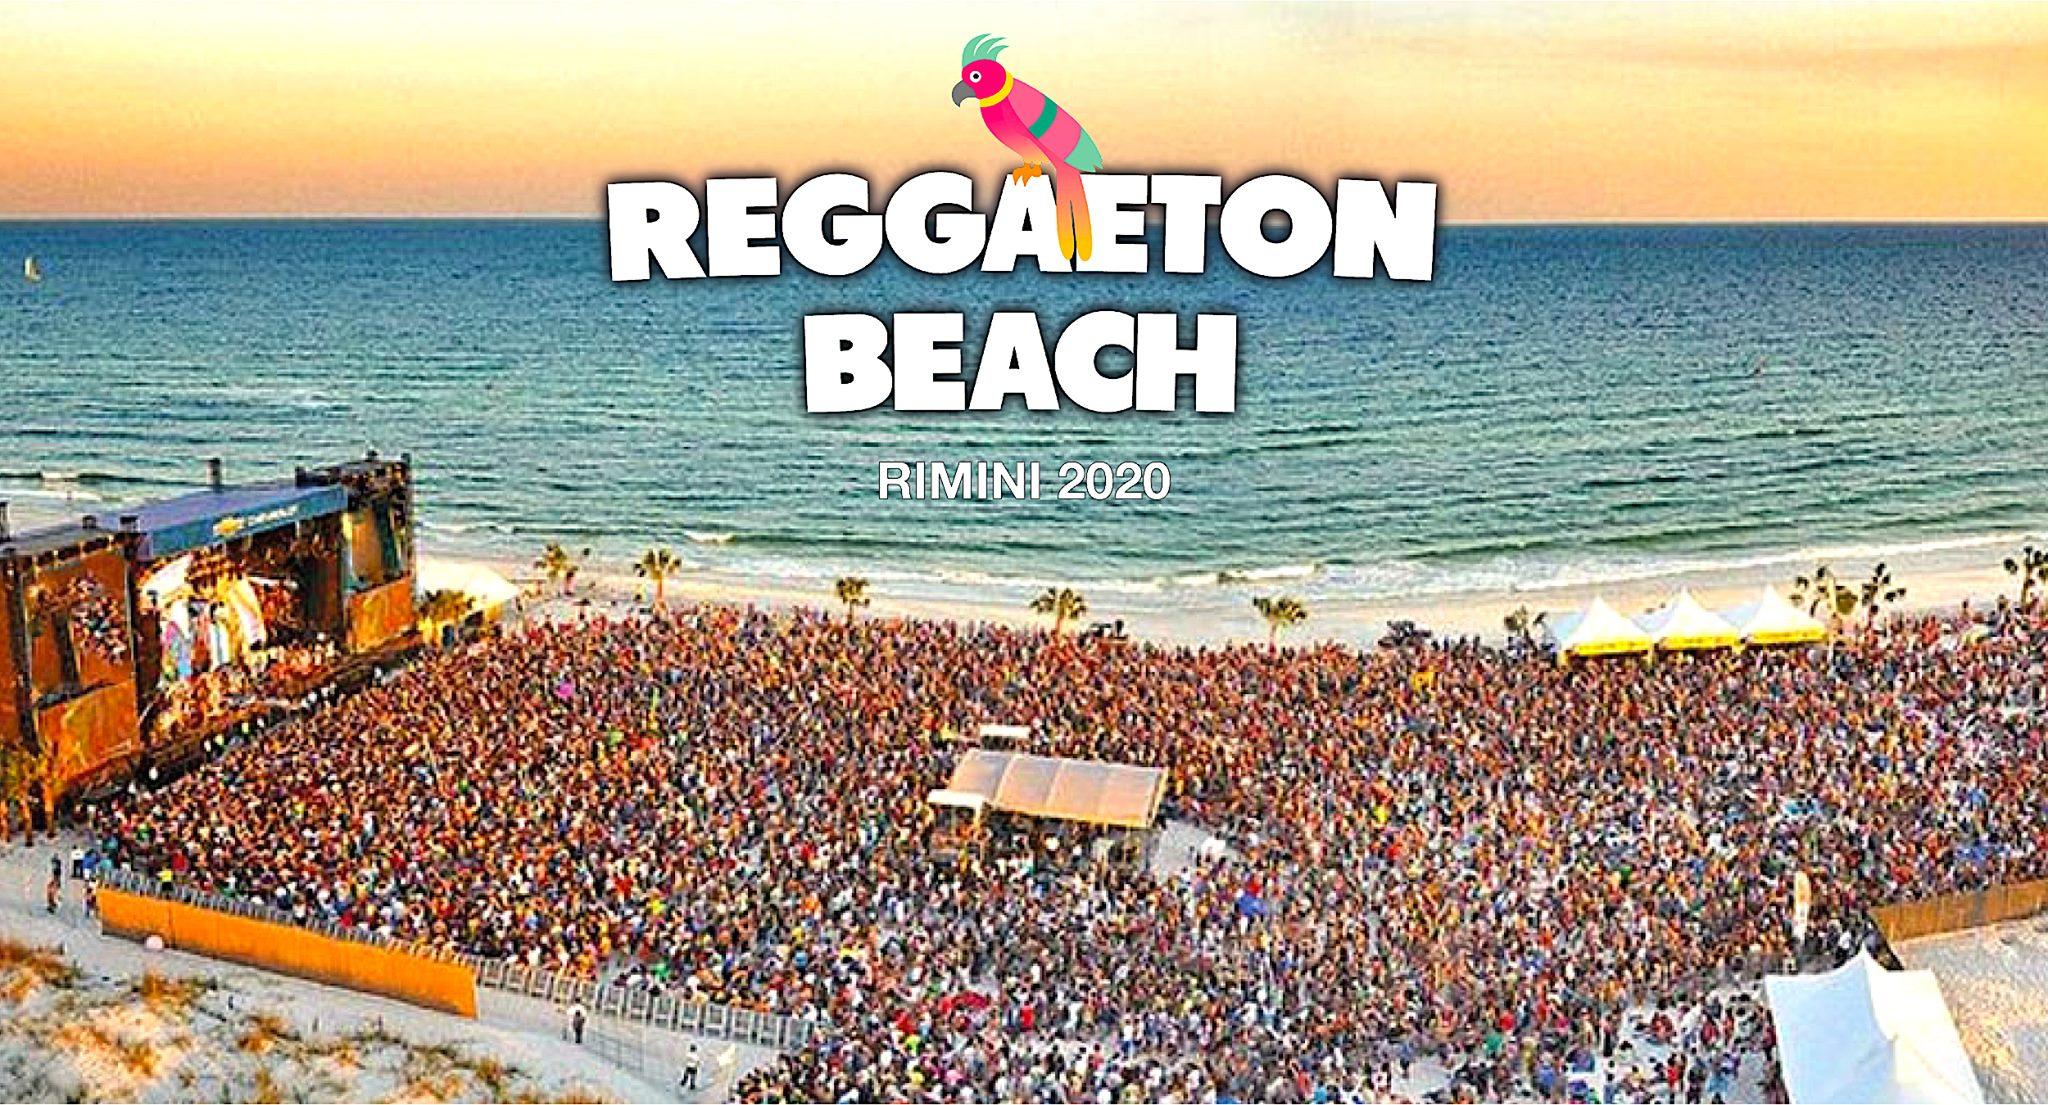 reggaeton beach festival rimini